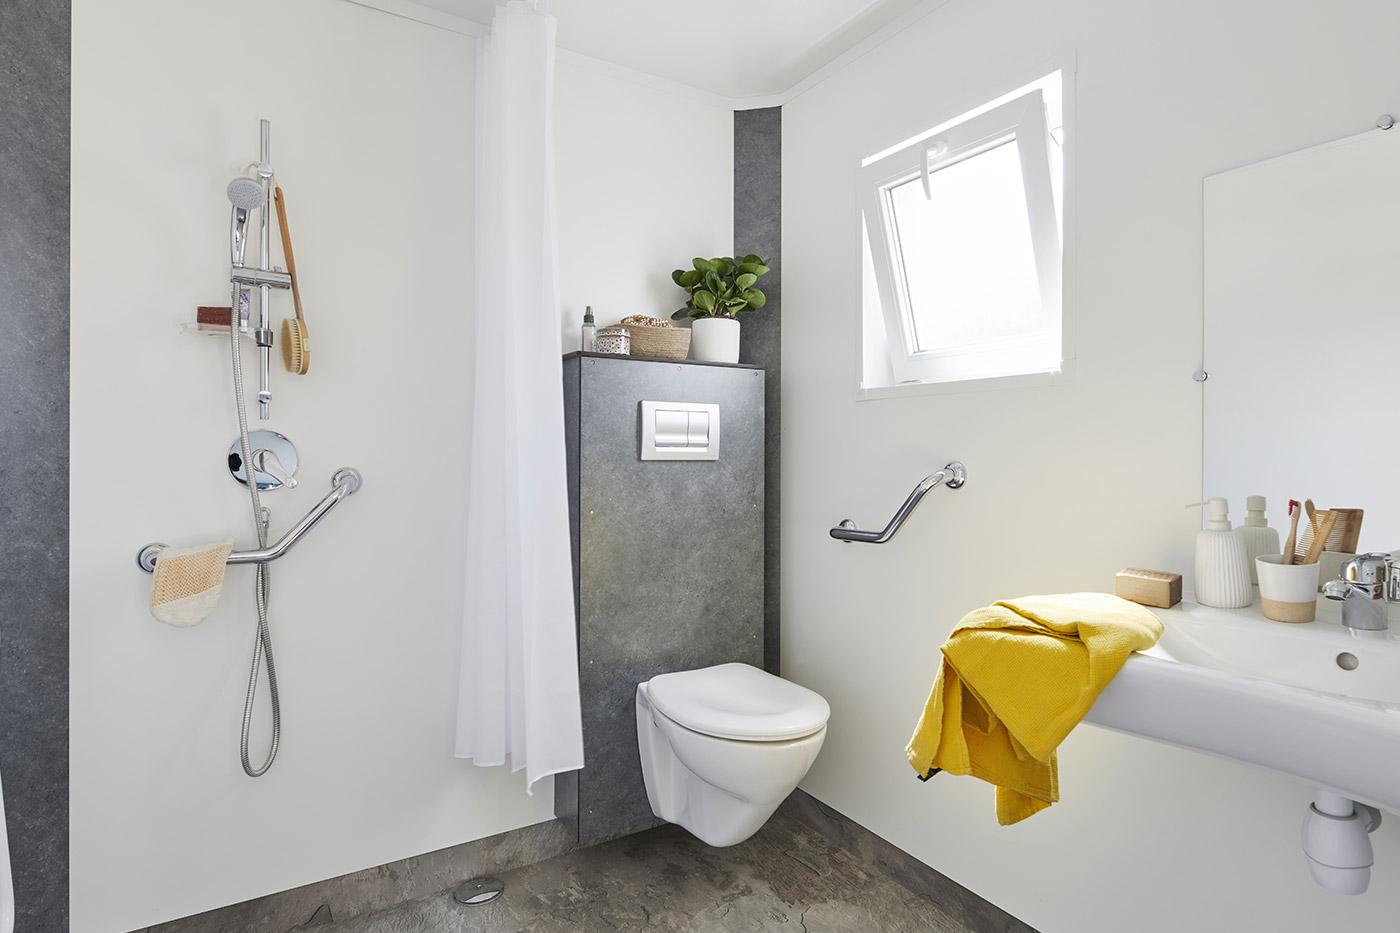 Vmc a pile salle de bain pics galerie d 39 inspiration pour - Vmc a pile salle de bain ...